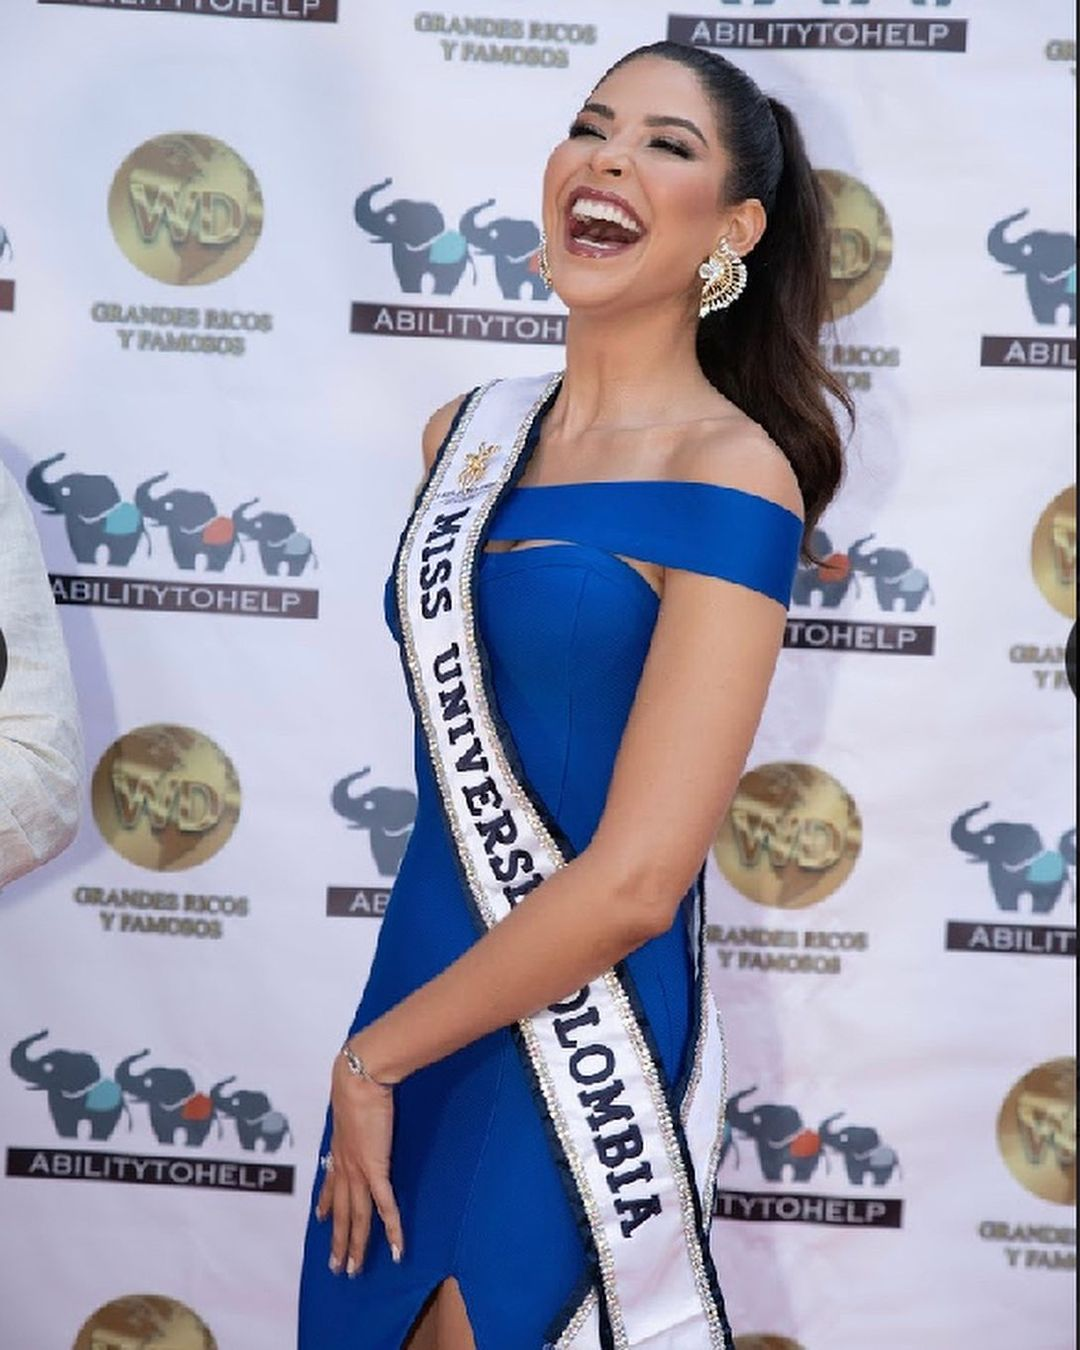 laura olascuaga, miss colombia universo 2020. - Página 20 20534915